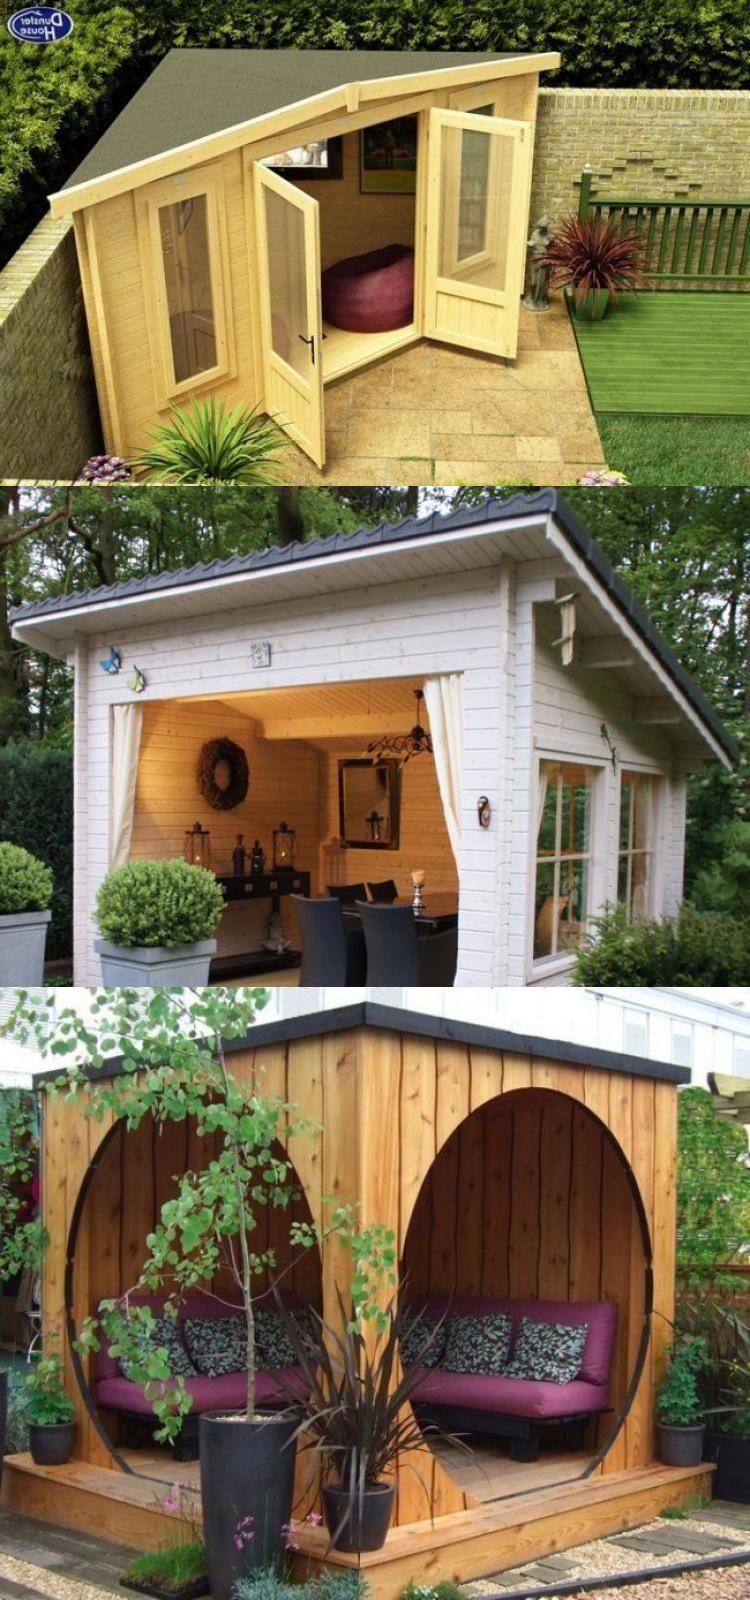 20 Adorable Outdoor Gazebo Design - Beautiful Improvement For Your